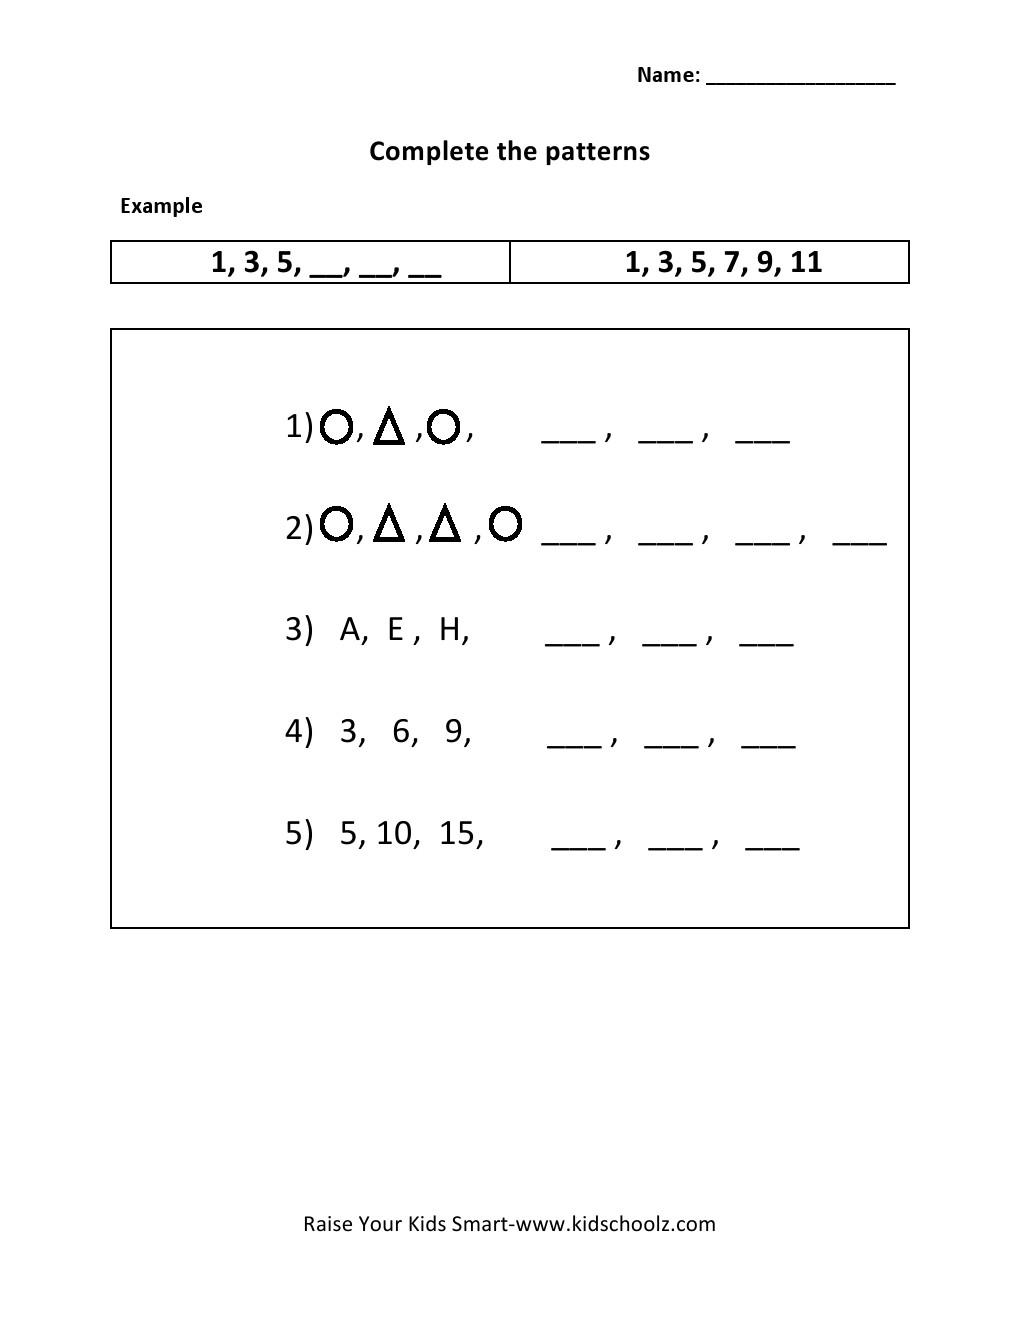 Pattern Worksheets Grade 1 The Best Worksheets Image Collection